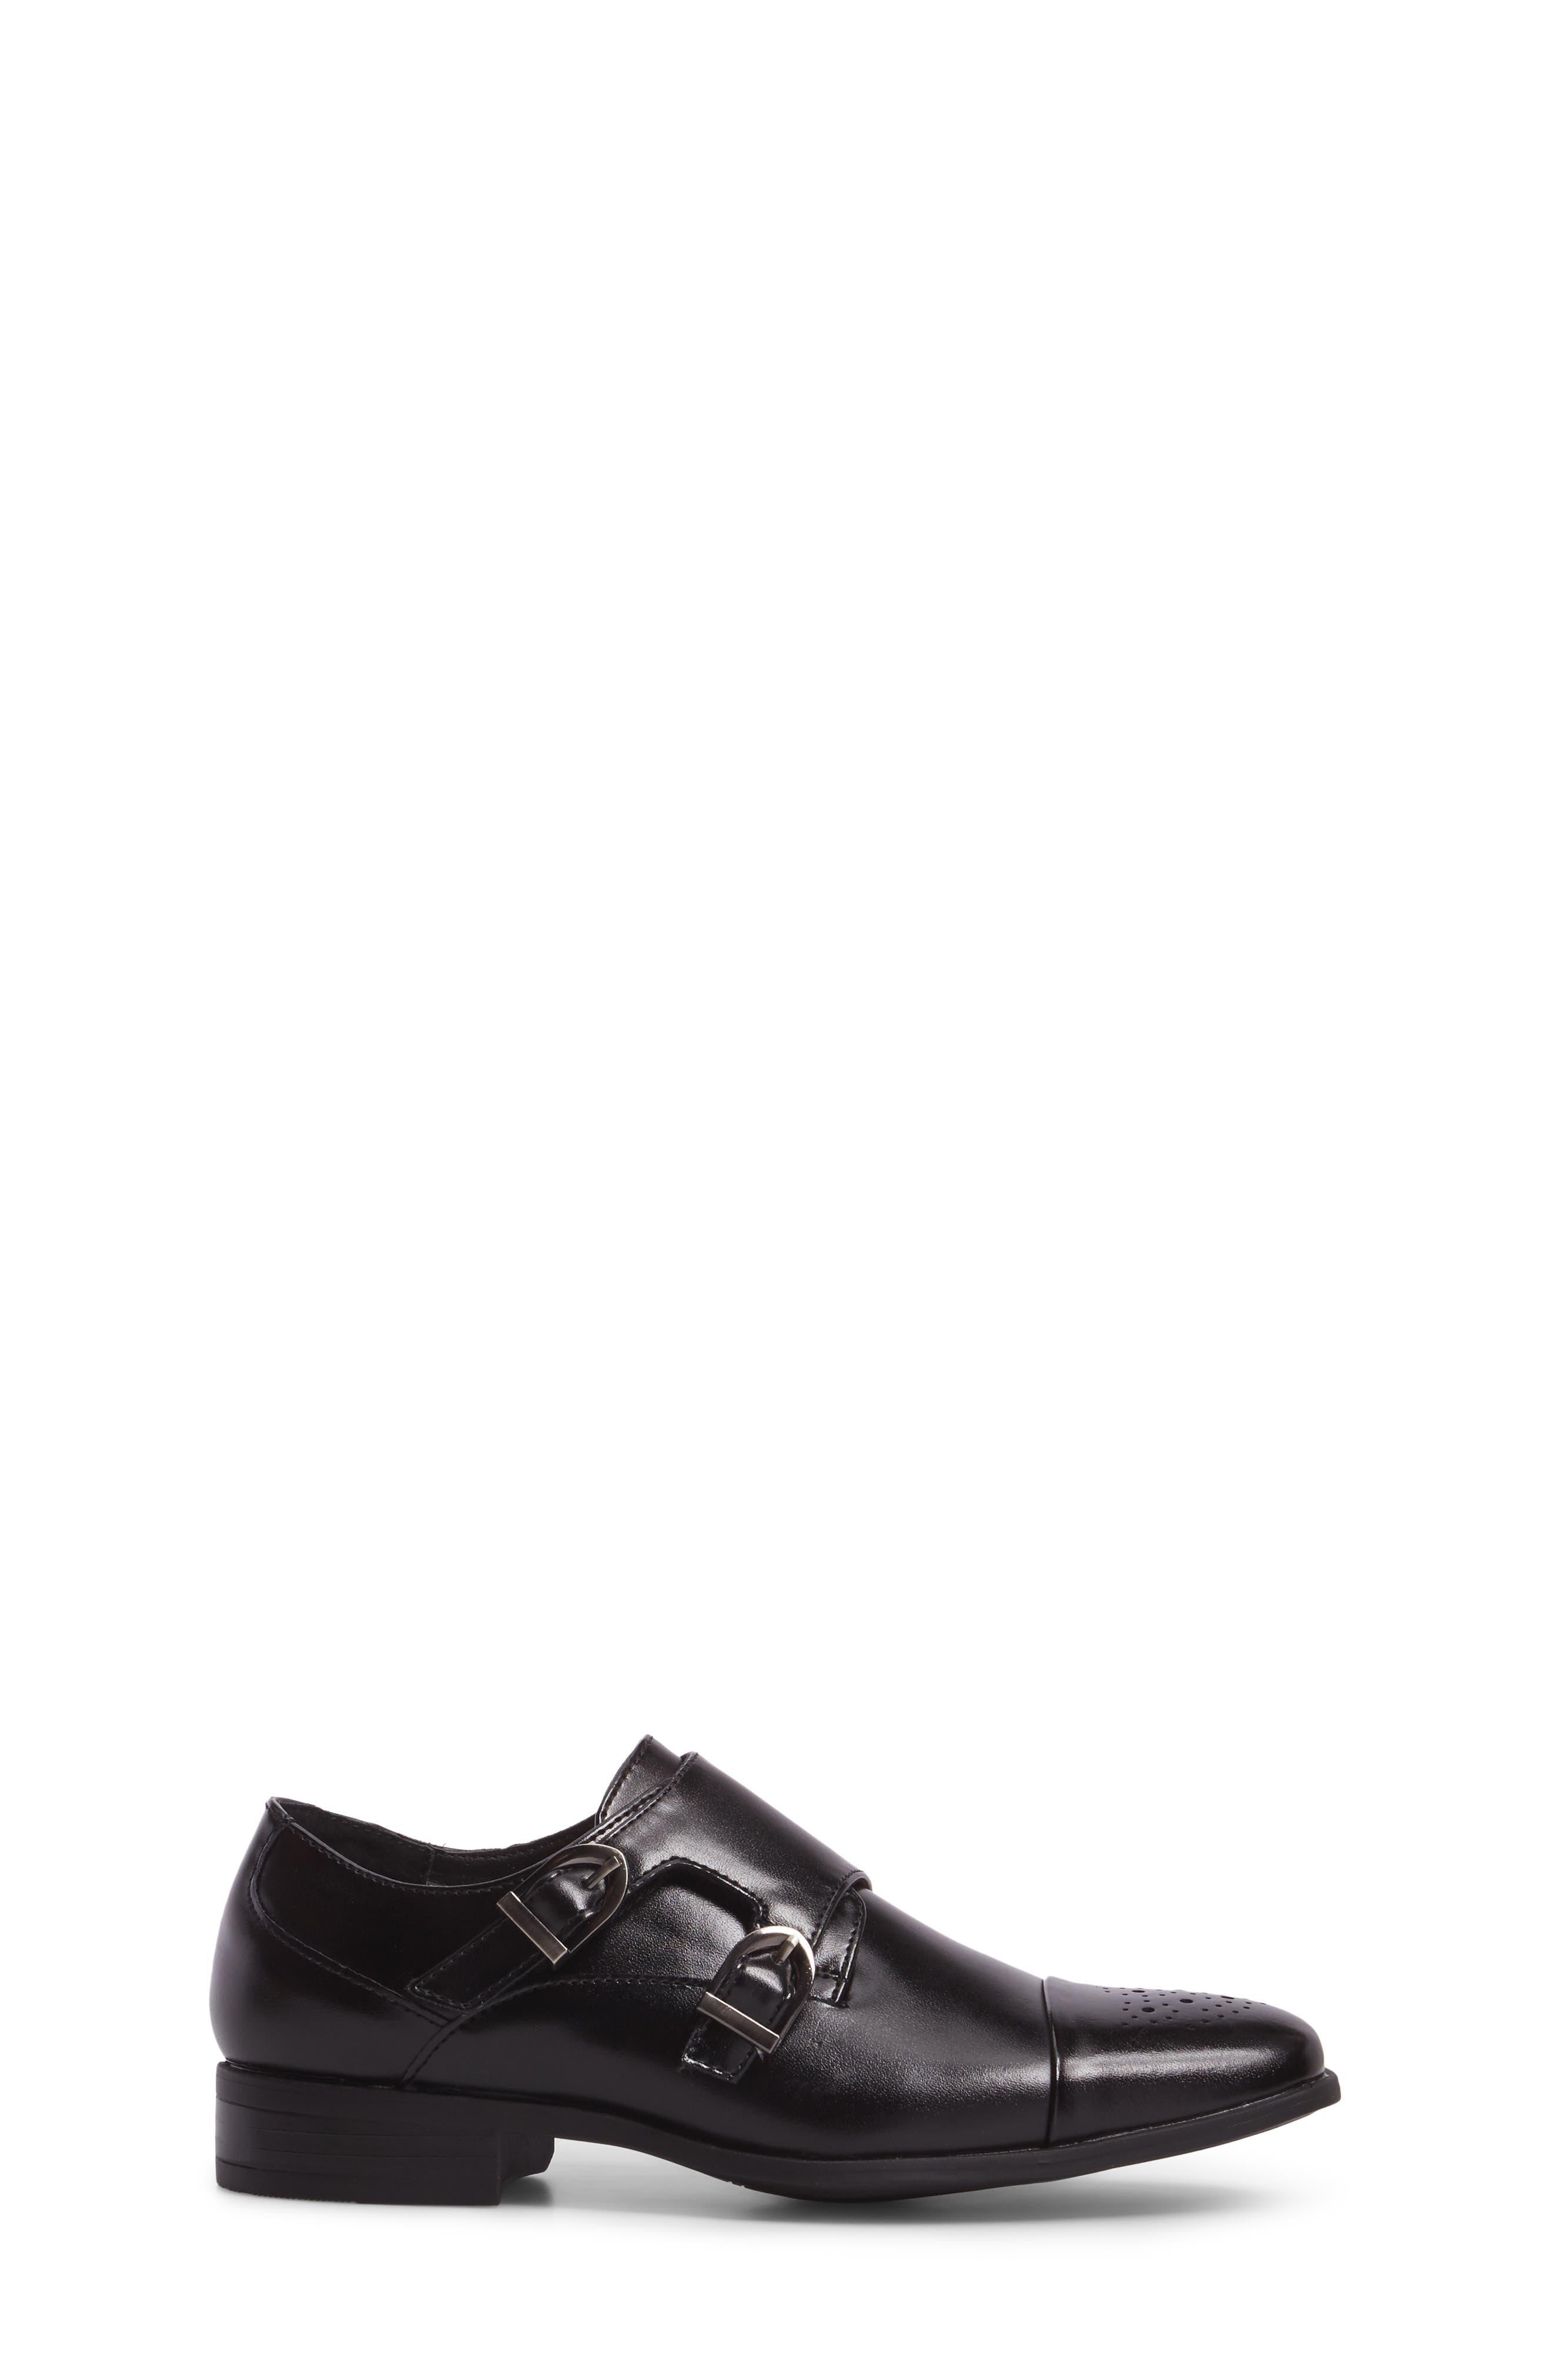 Trevor Cap Toe Monk Shoe,                             Alternate thumbnail 3, color,                             001